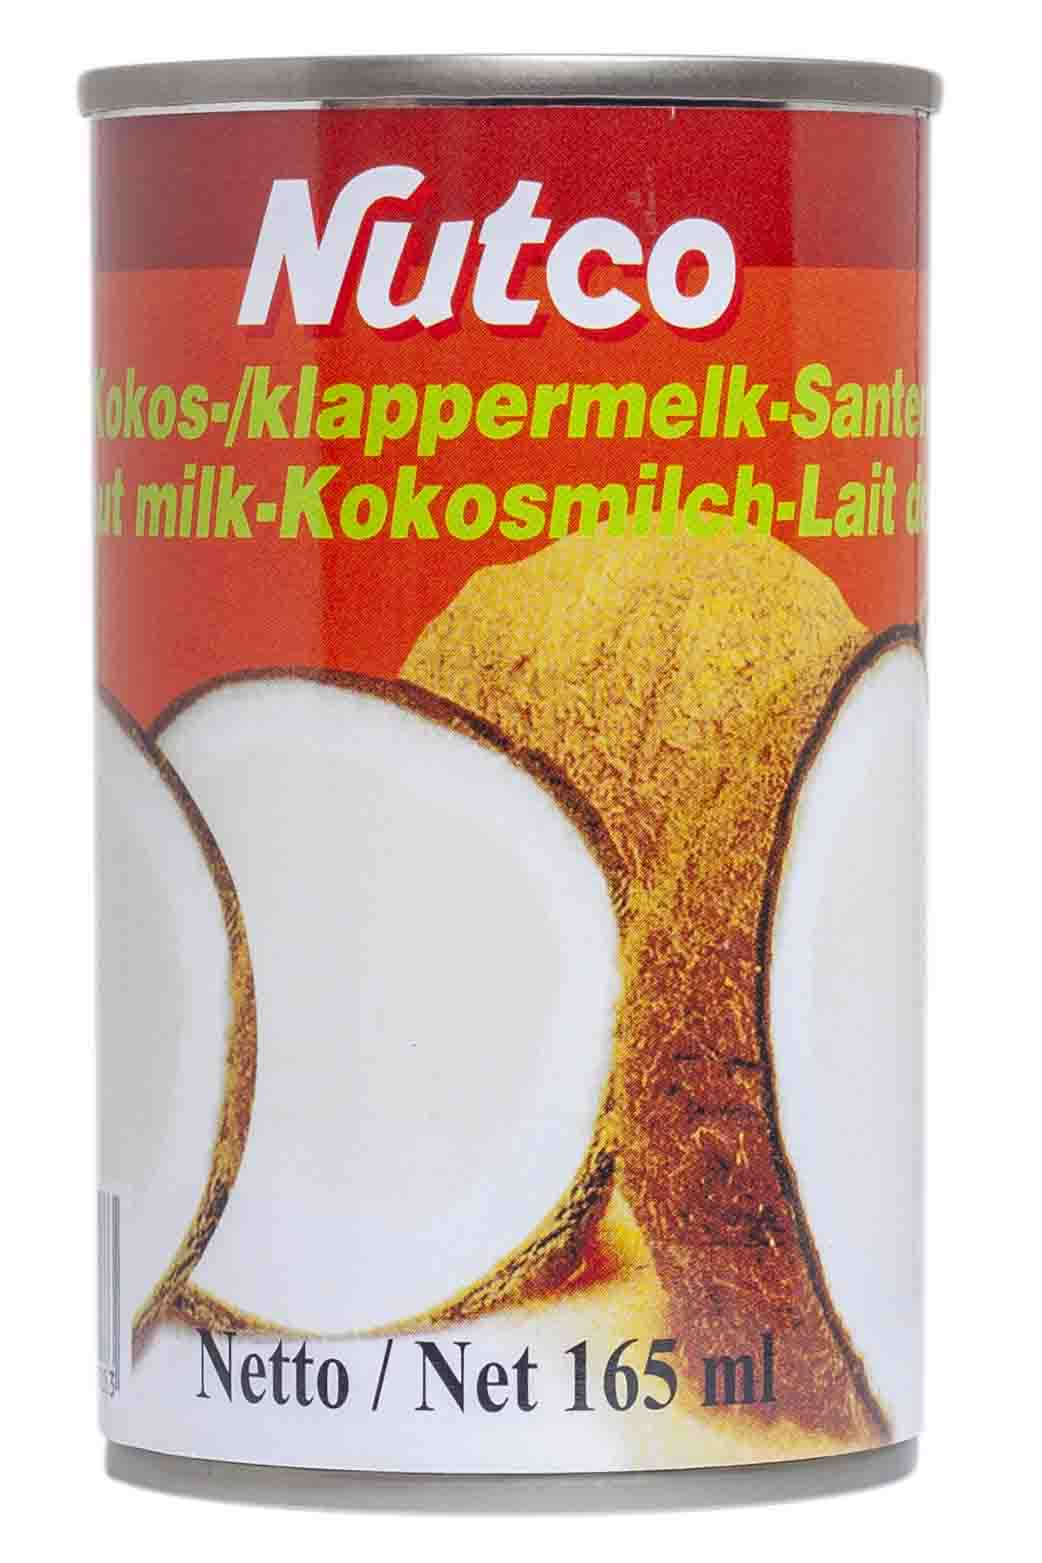 Nutco cocosmelk 165ml